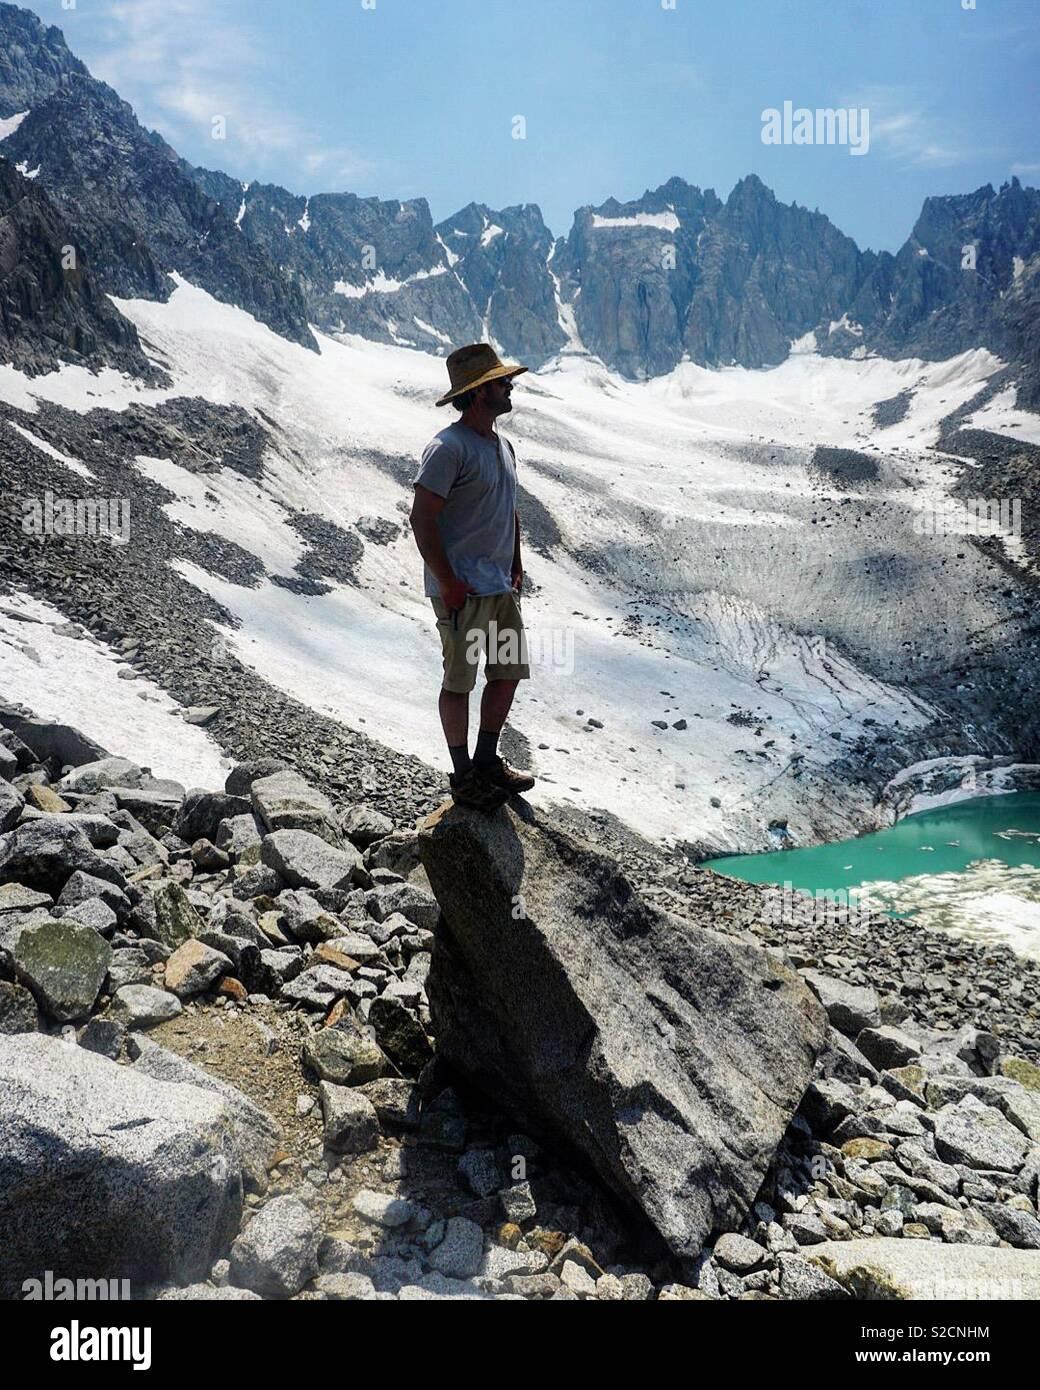 Justin Ferguson at Palisade Glacier - Stock Image